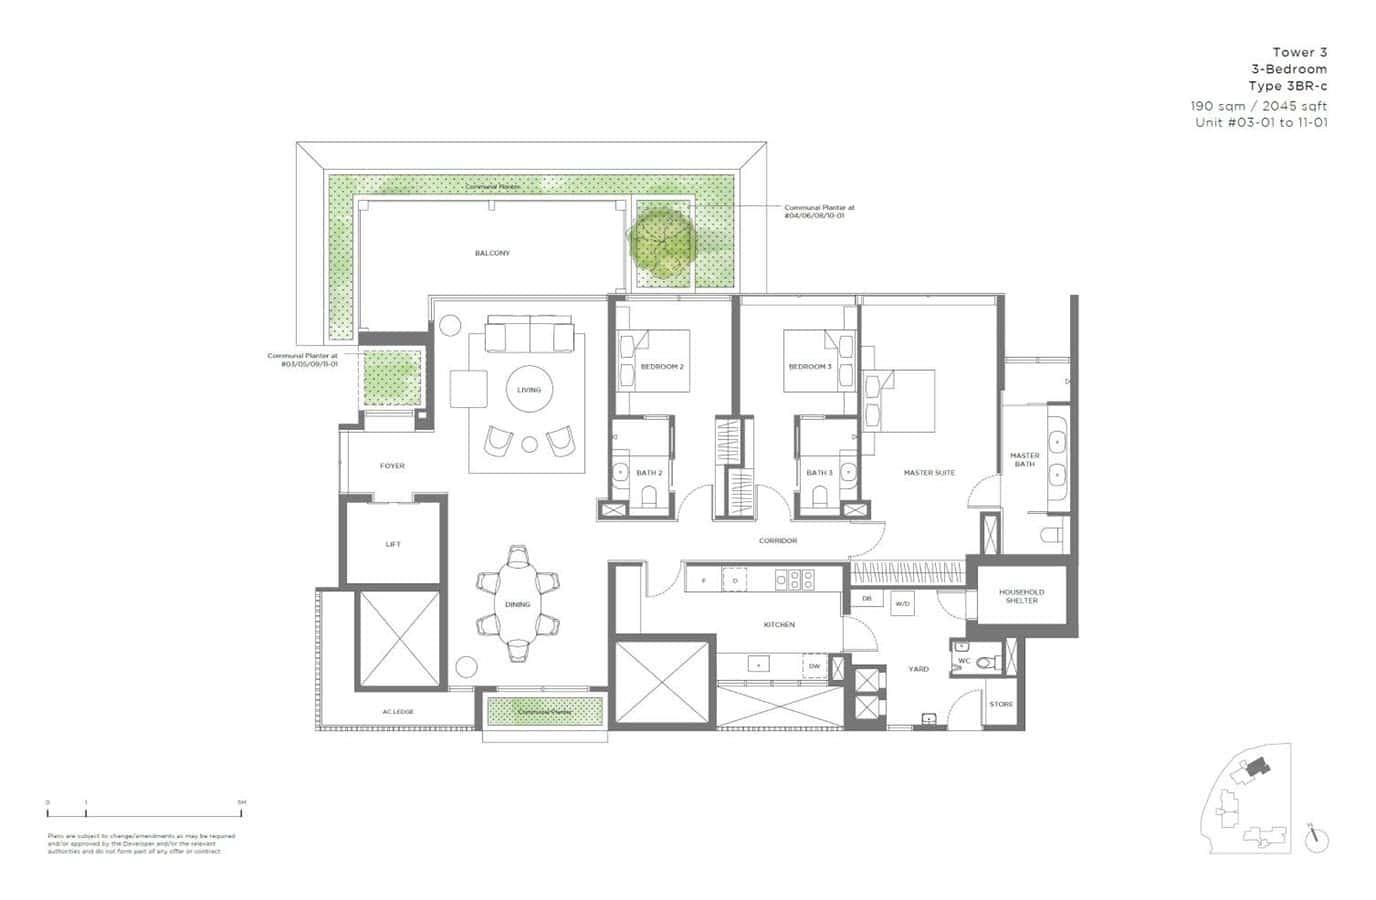 15 Holland Hill - Floor Plan - 3 Bedroom 3BR-c